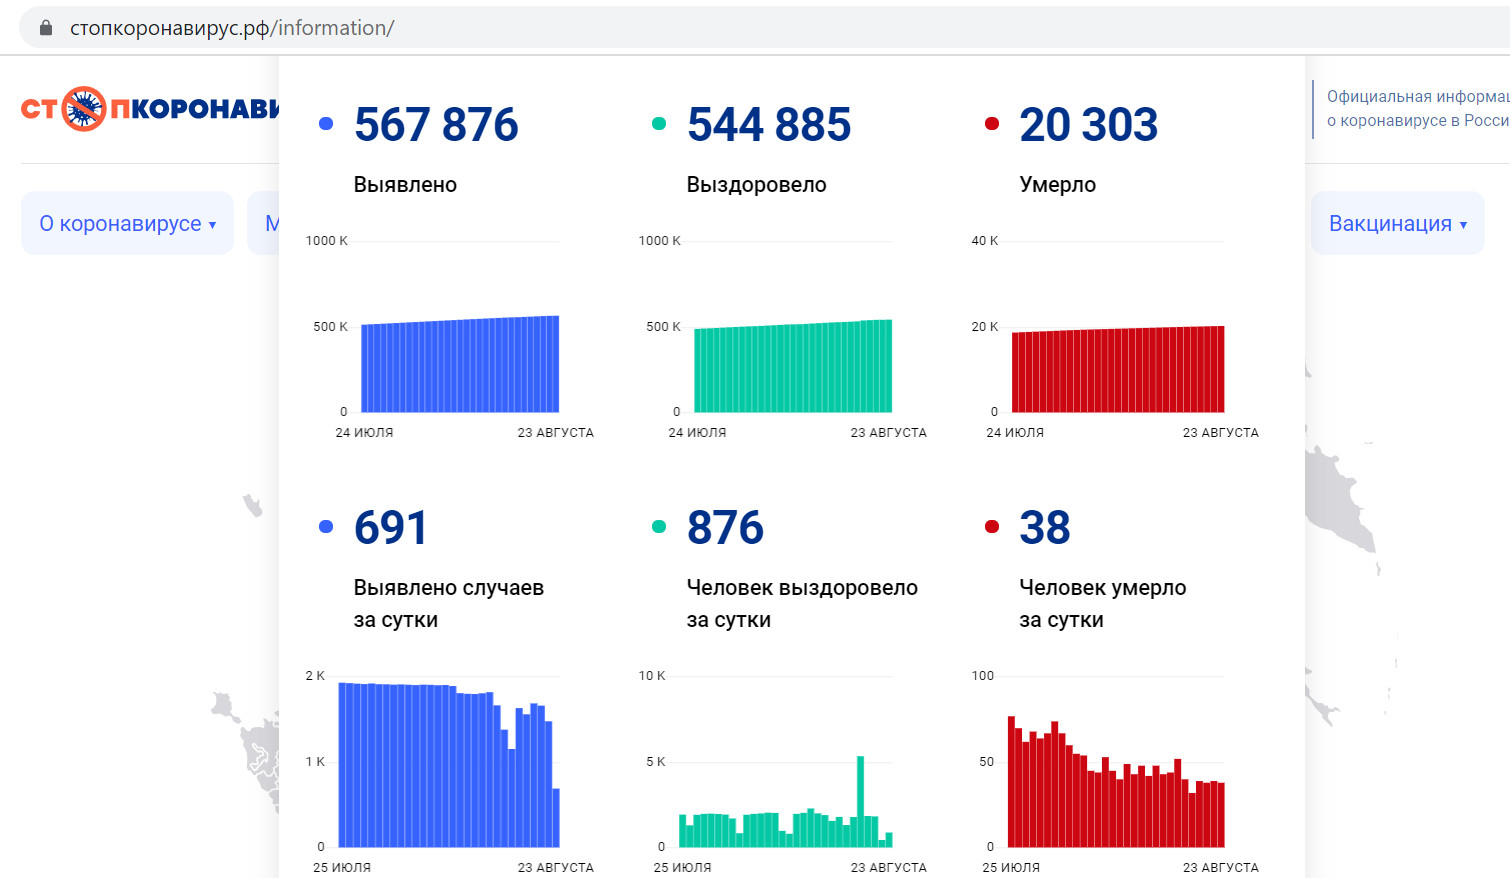 Коронавирусная статистика по Петербургу на 23 августа 2021 года. Скриншот с сайта «Стопкоронавирус.рф»